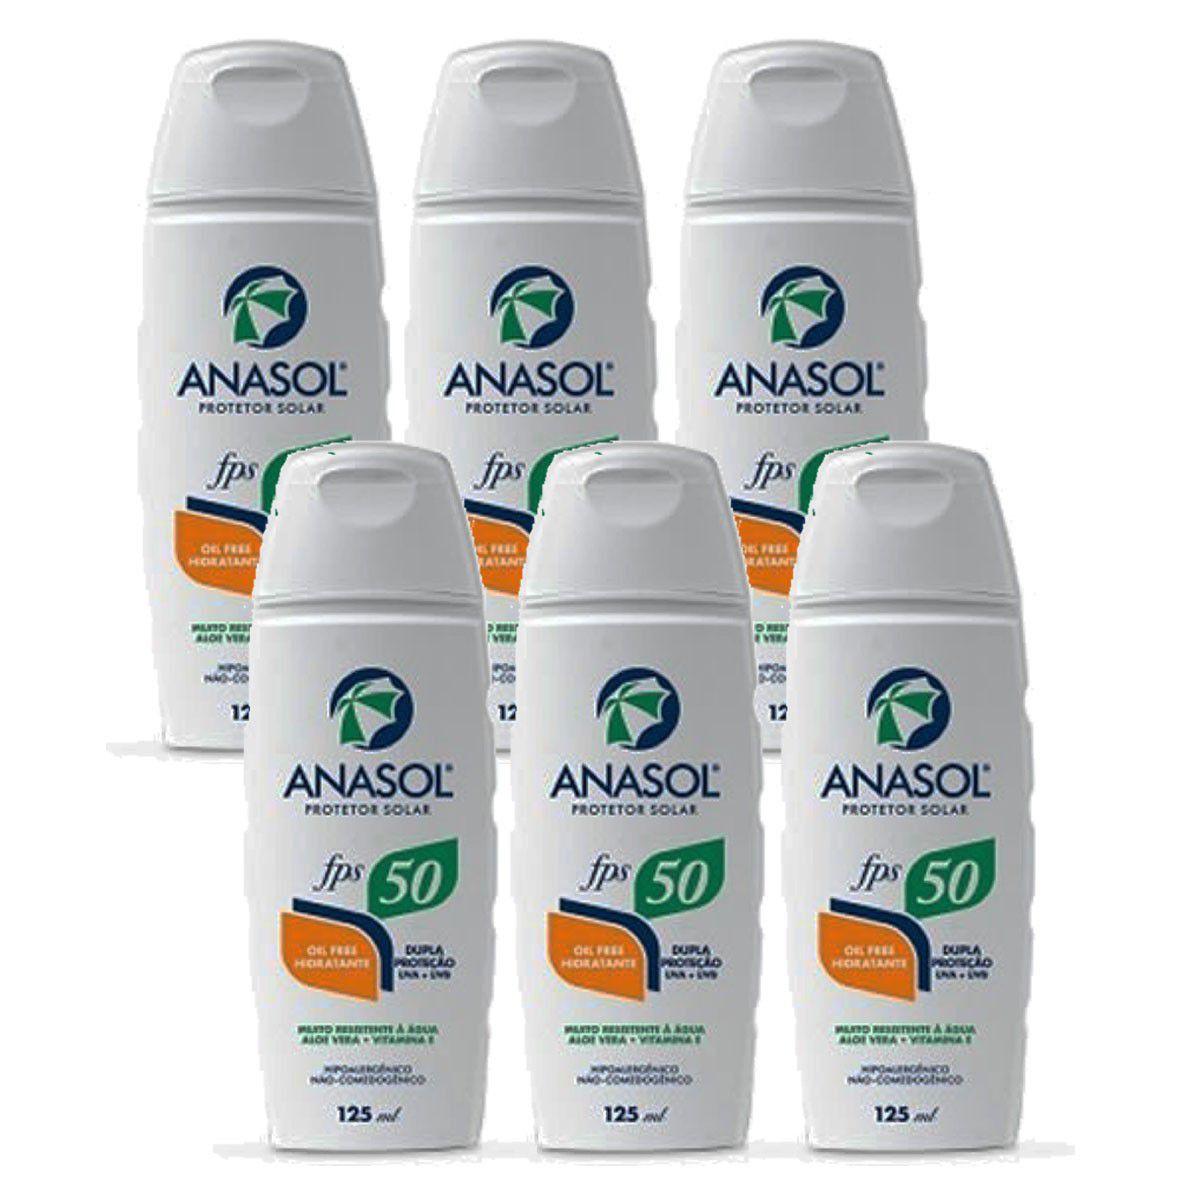 Kit 6 Und Protetor Solar Anasol Fps 50 Oil Free Hipoalergênico 125 ml